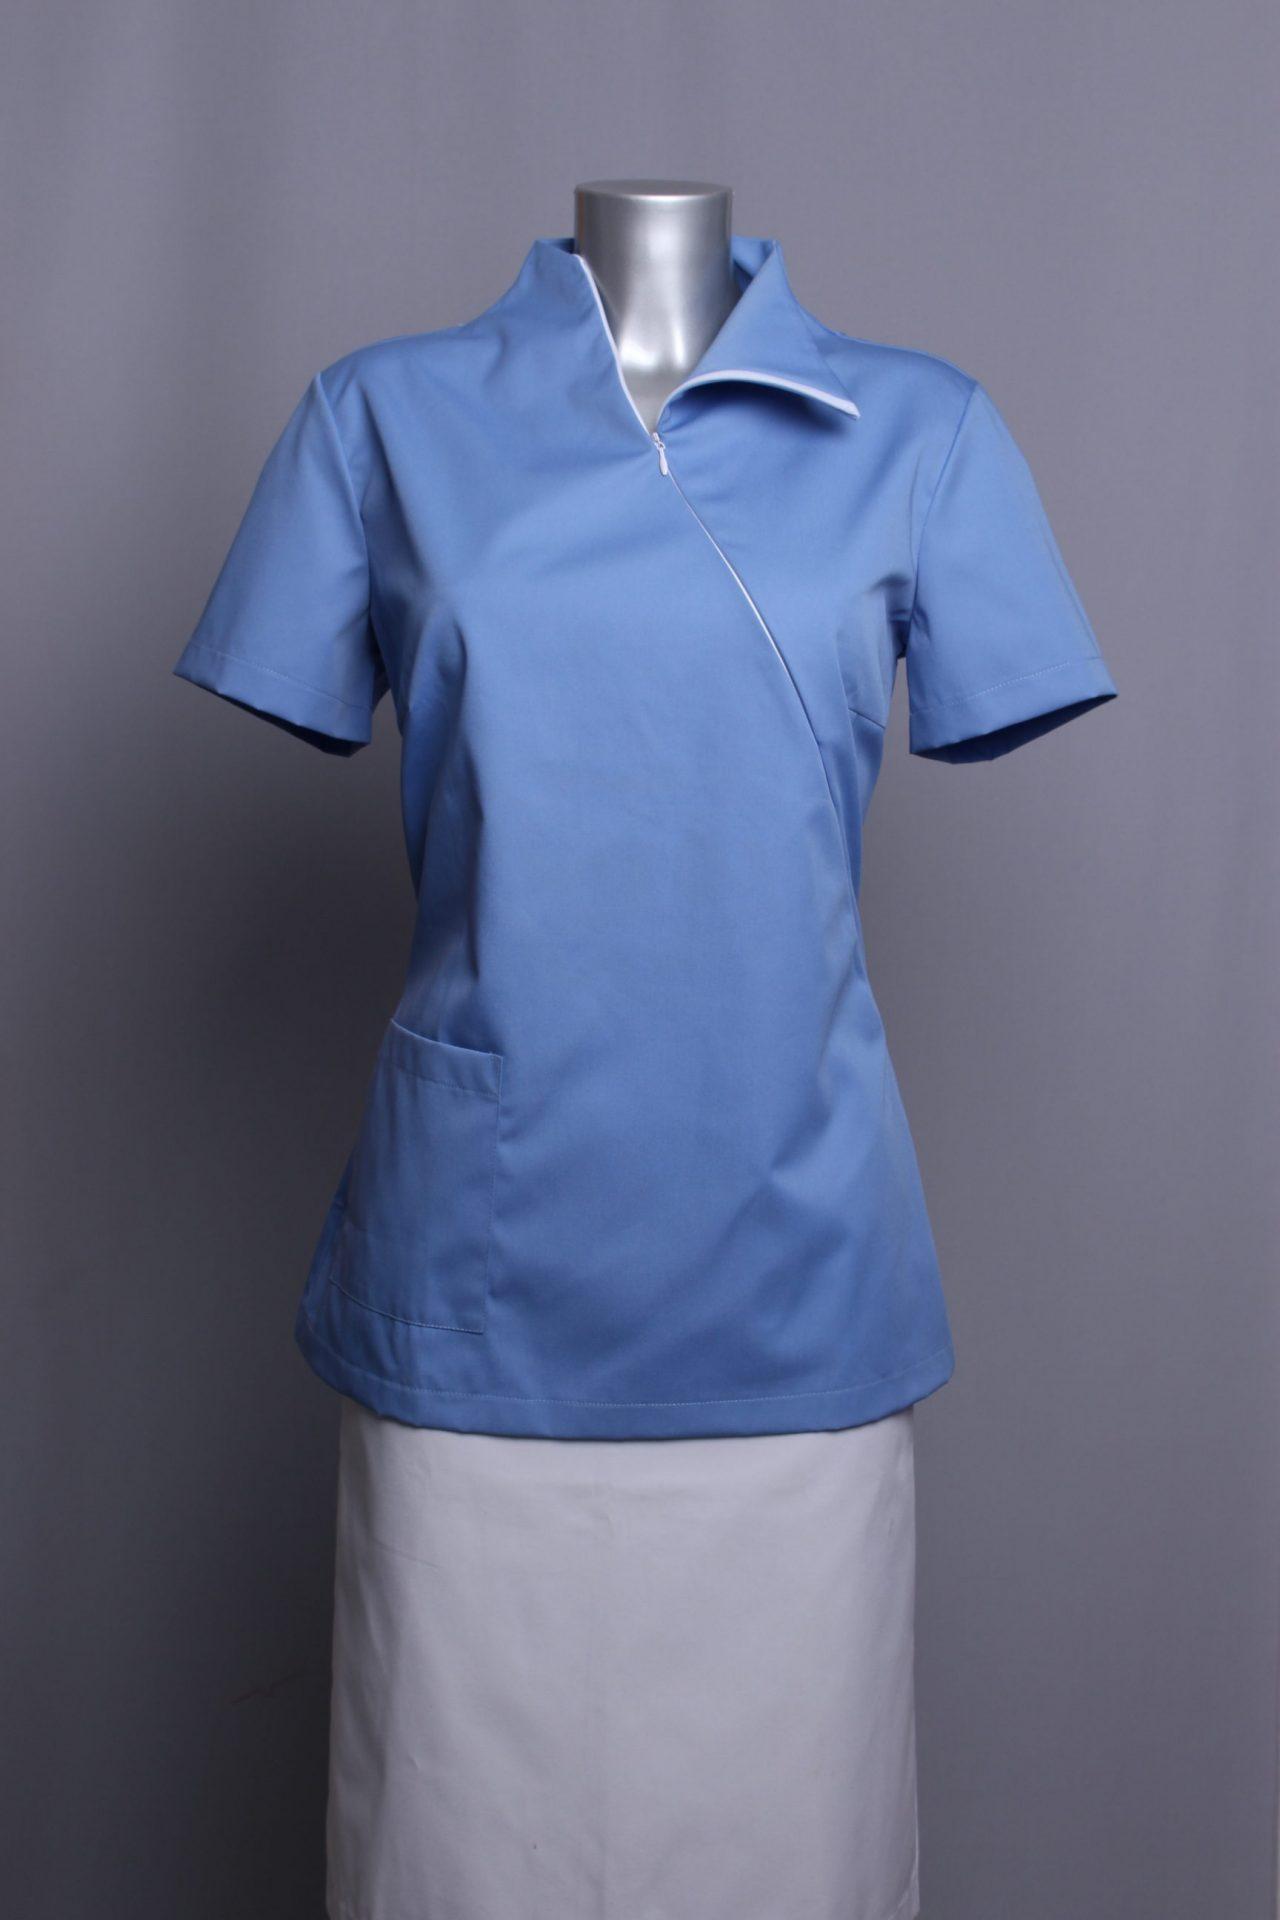 medicinske kute, kute za medicinske sestre